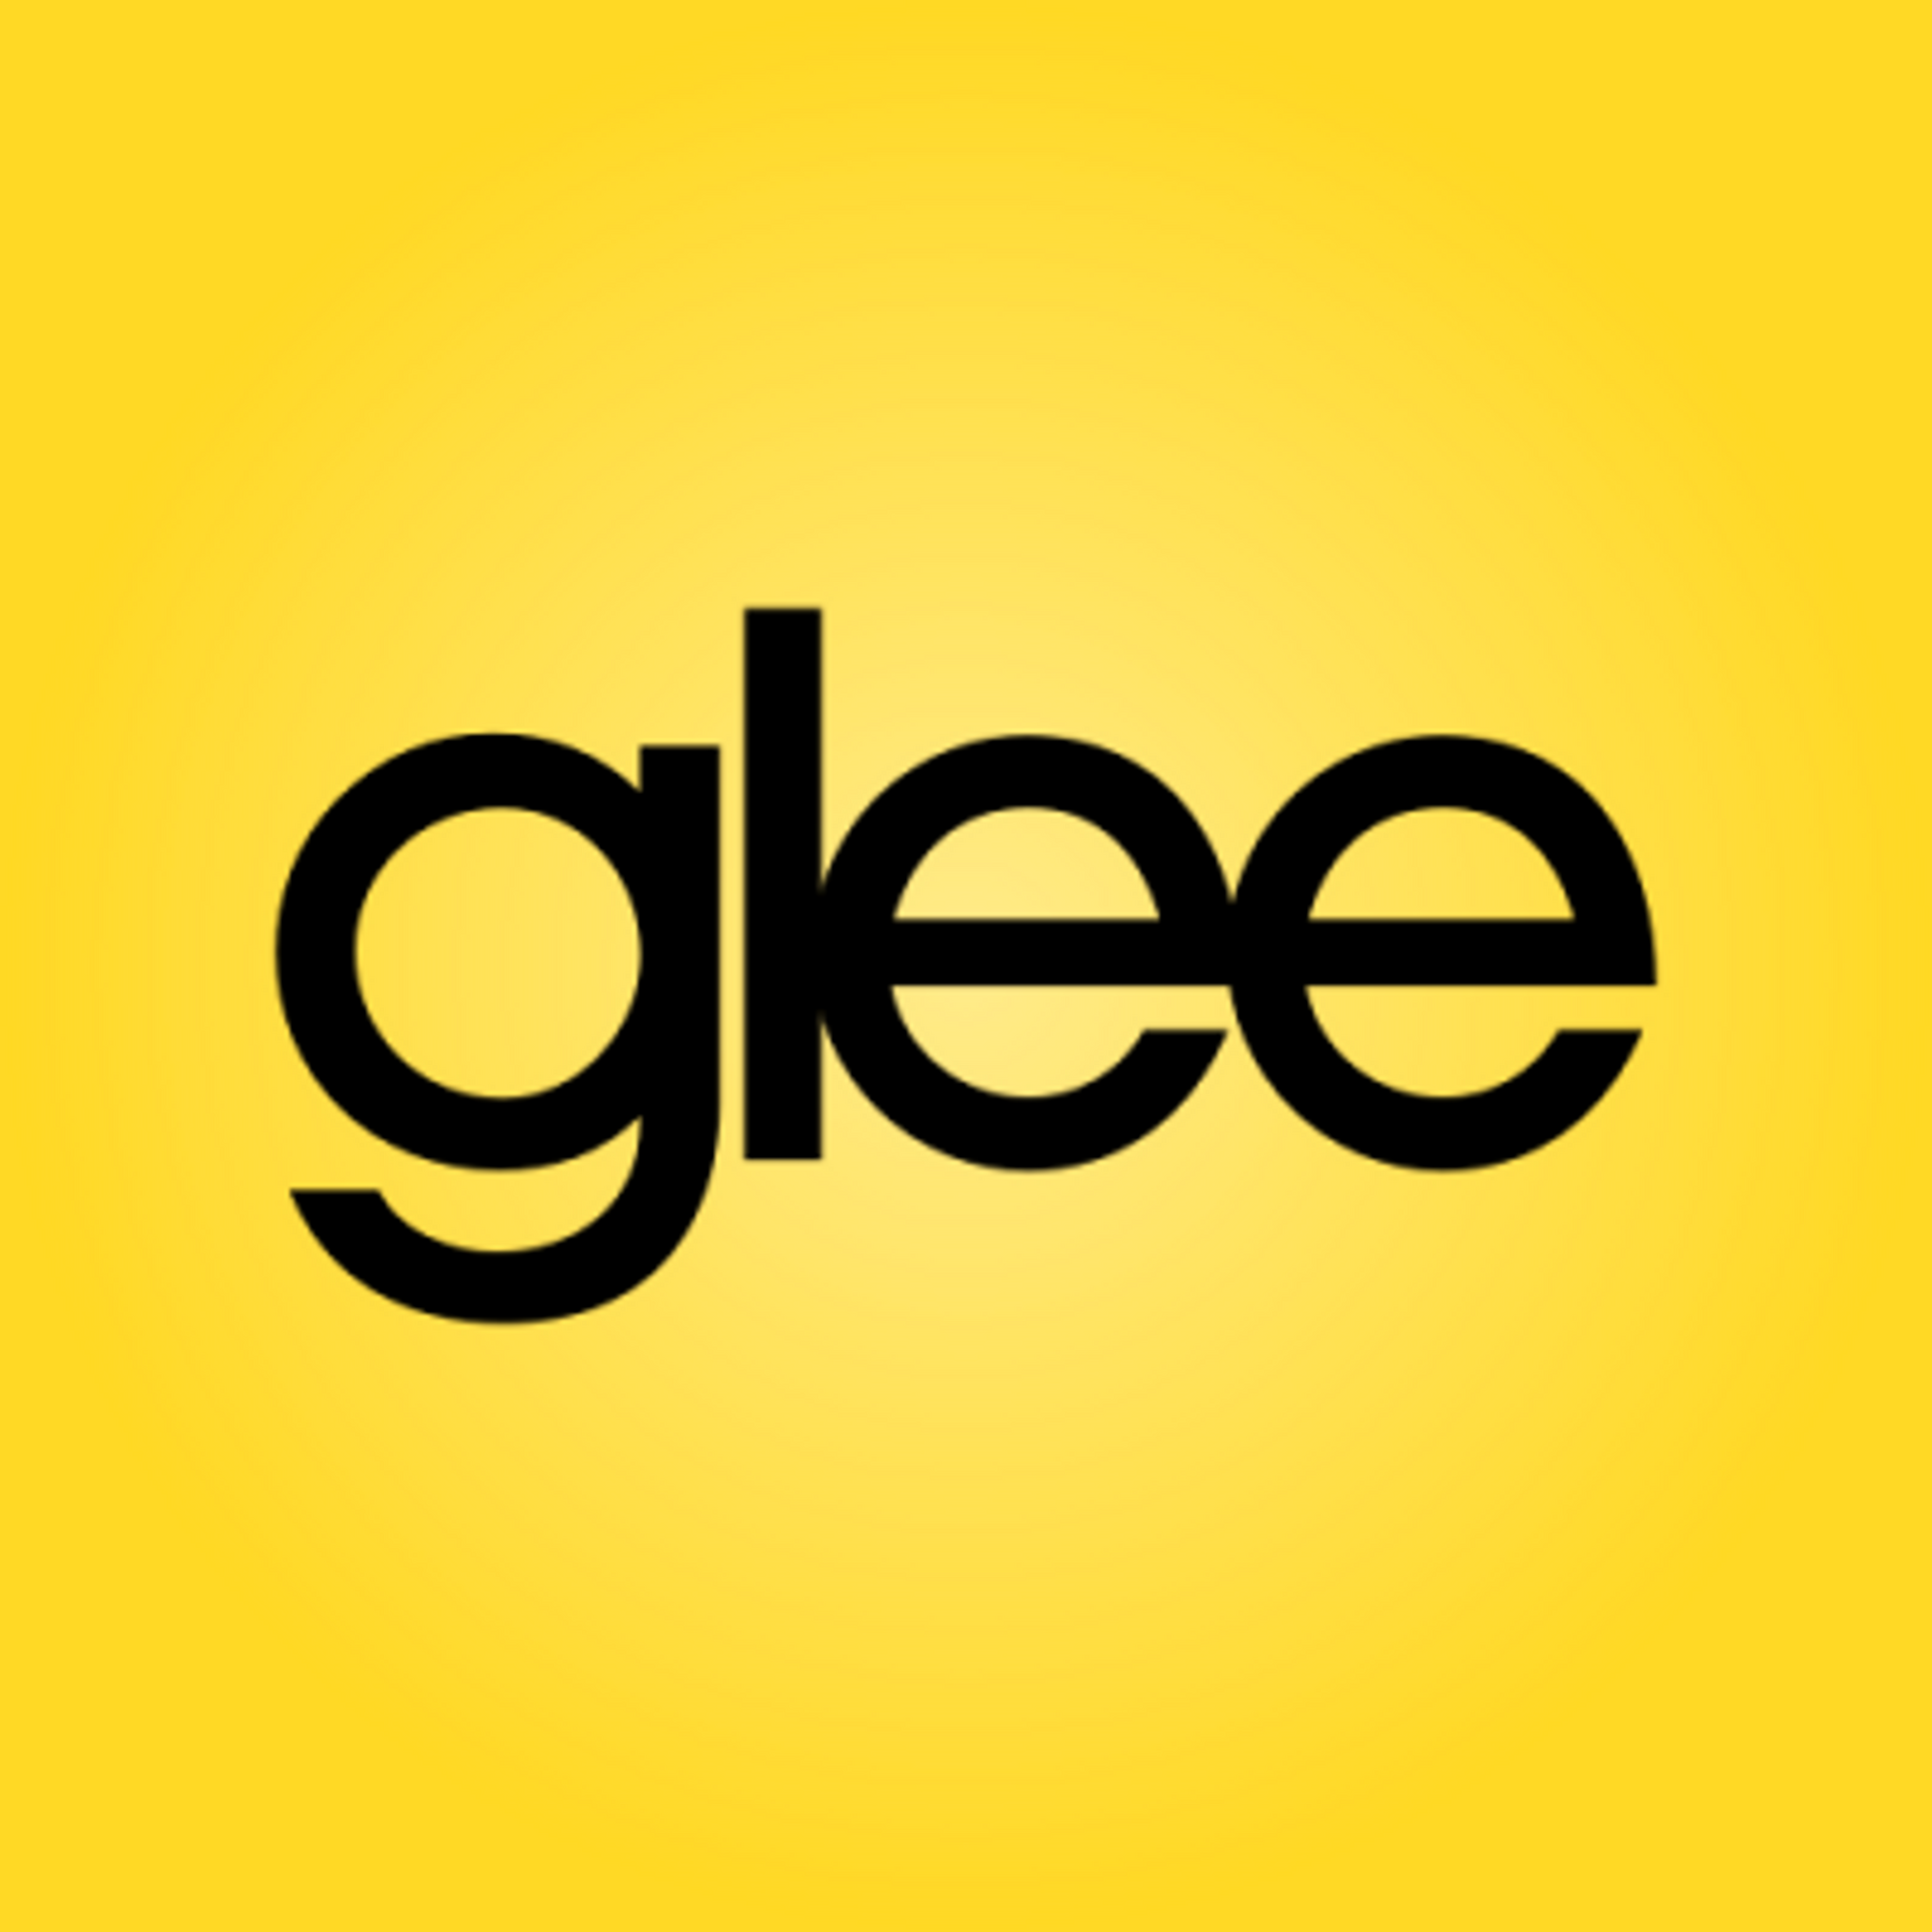 Glee big brother duran duran wiki fandom powered by wikia buycottarizona